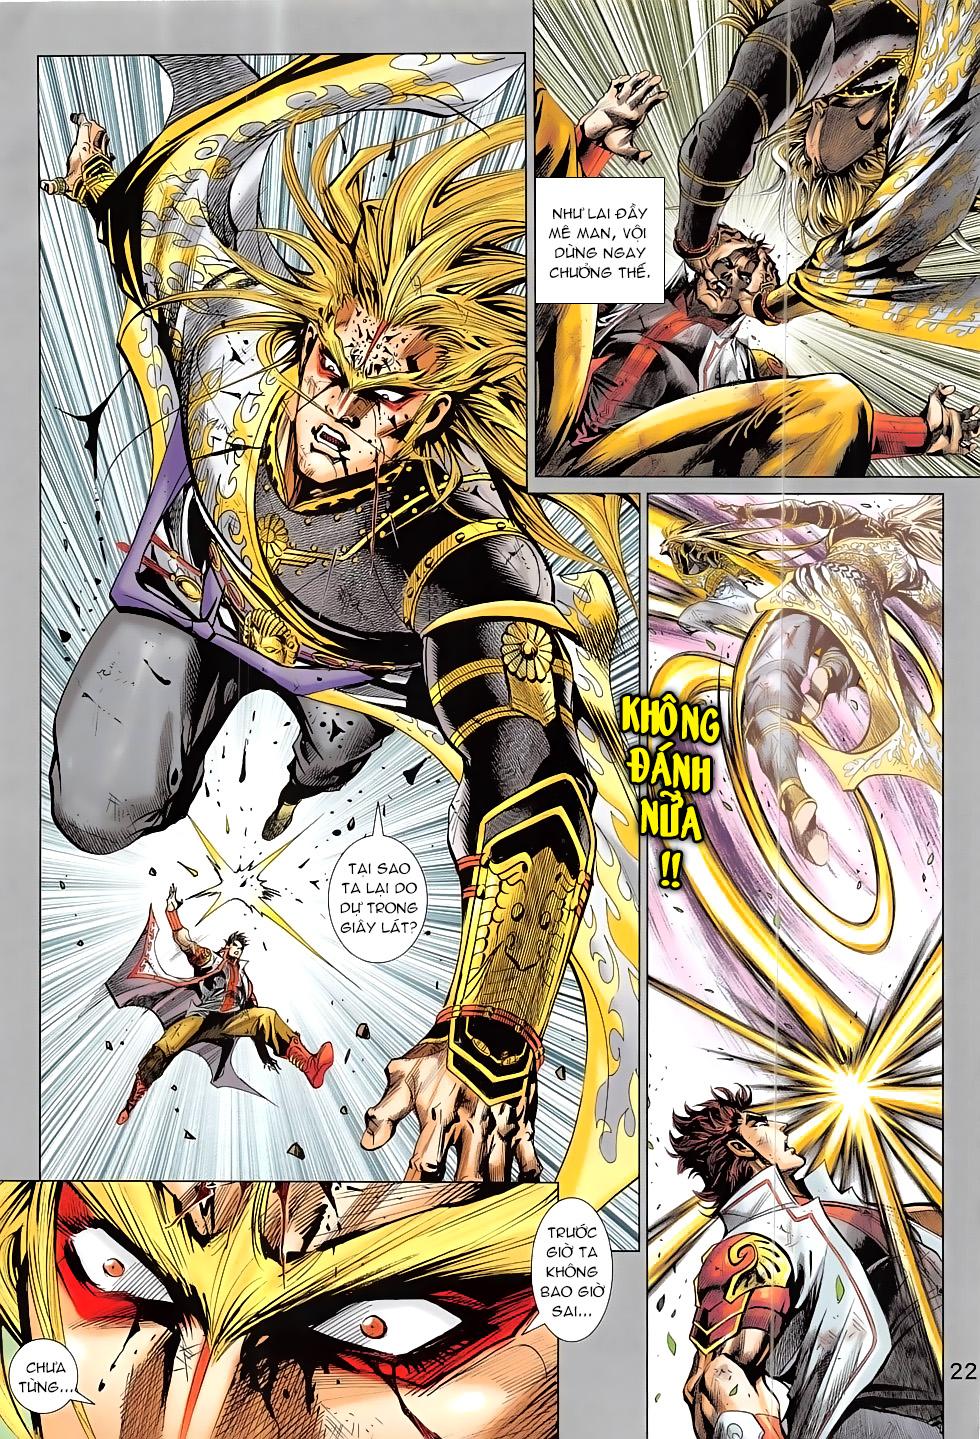 Thần Chưởng chap 24 – End Trang 22 - Mangak.info